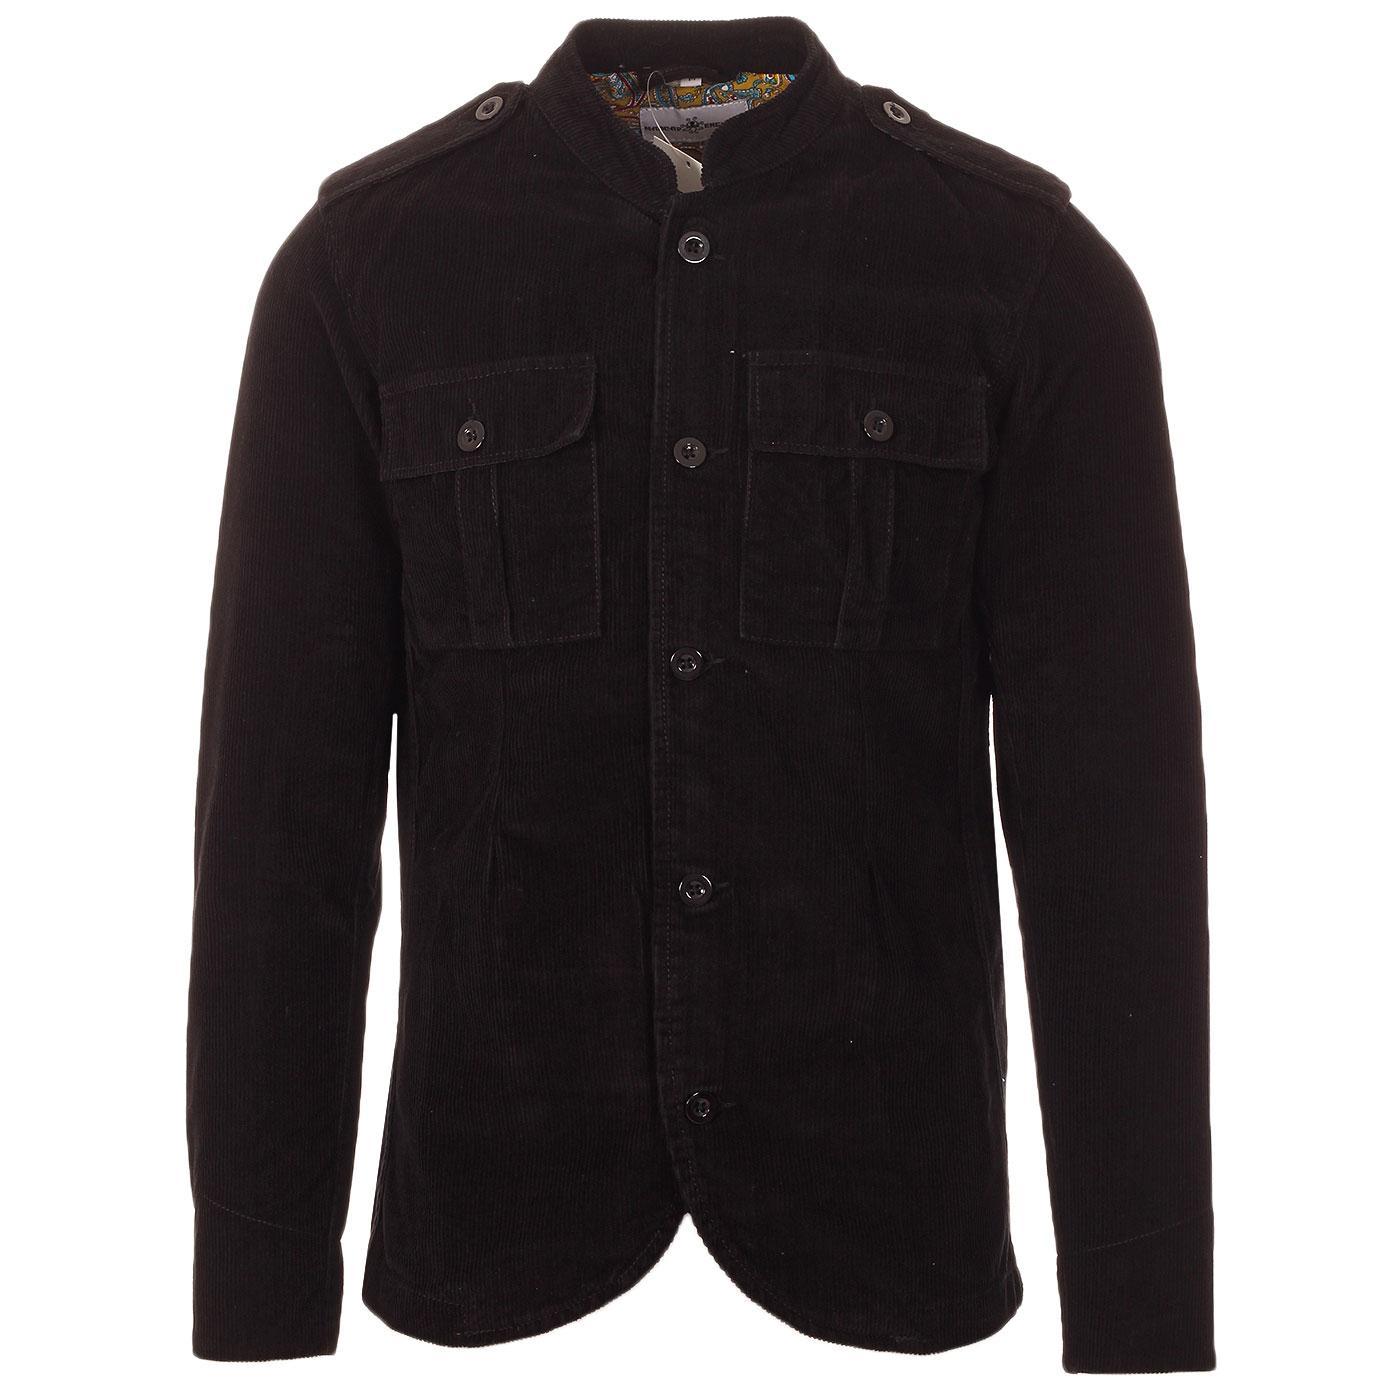 Pepper MADCAP ENGLAND Mod Cord Tunic Jacket BLACK